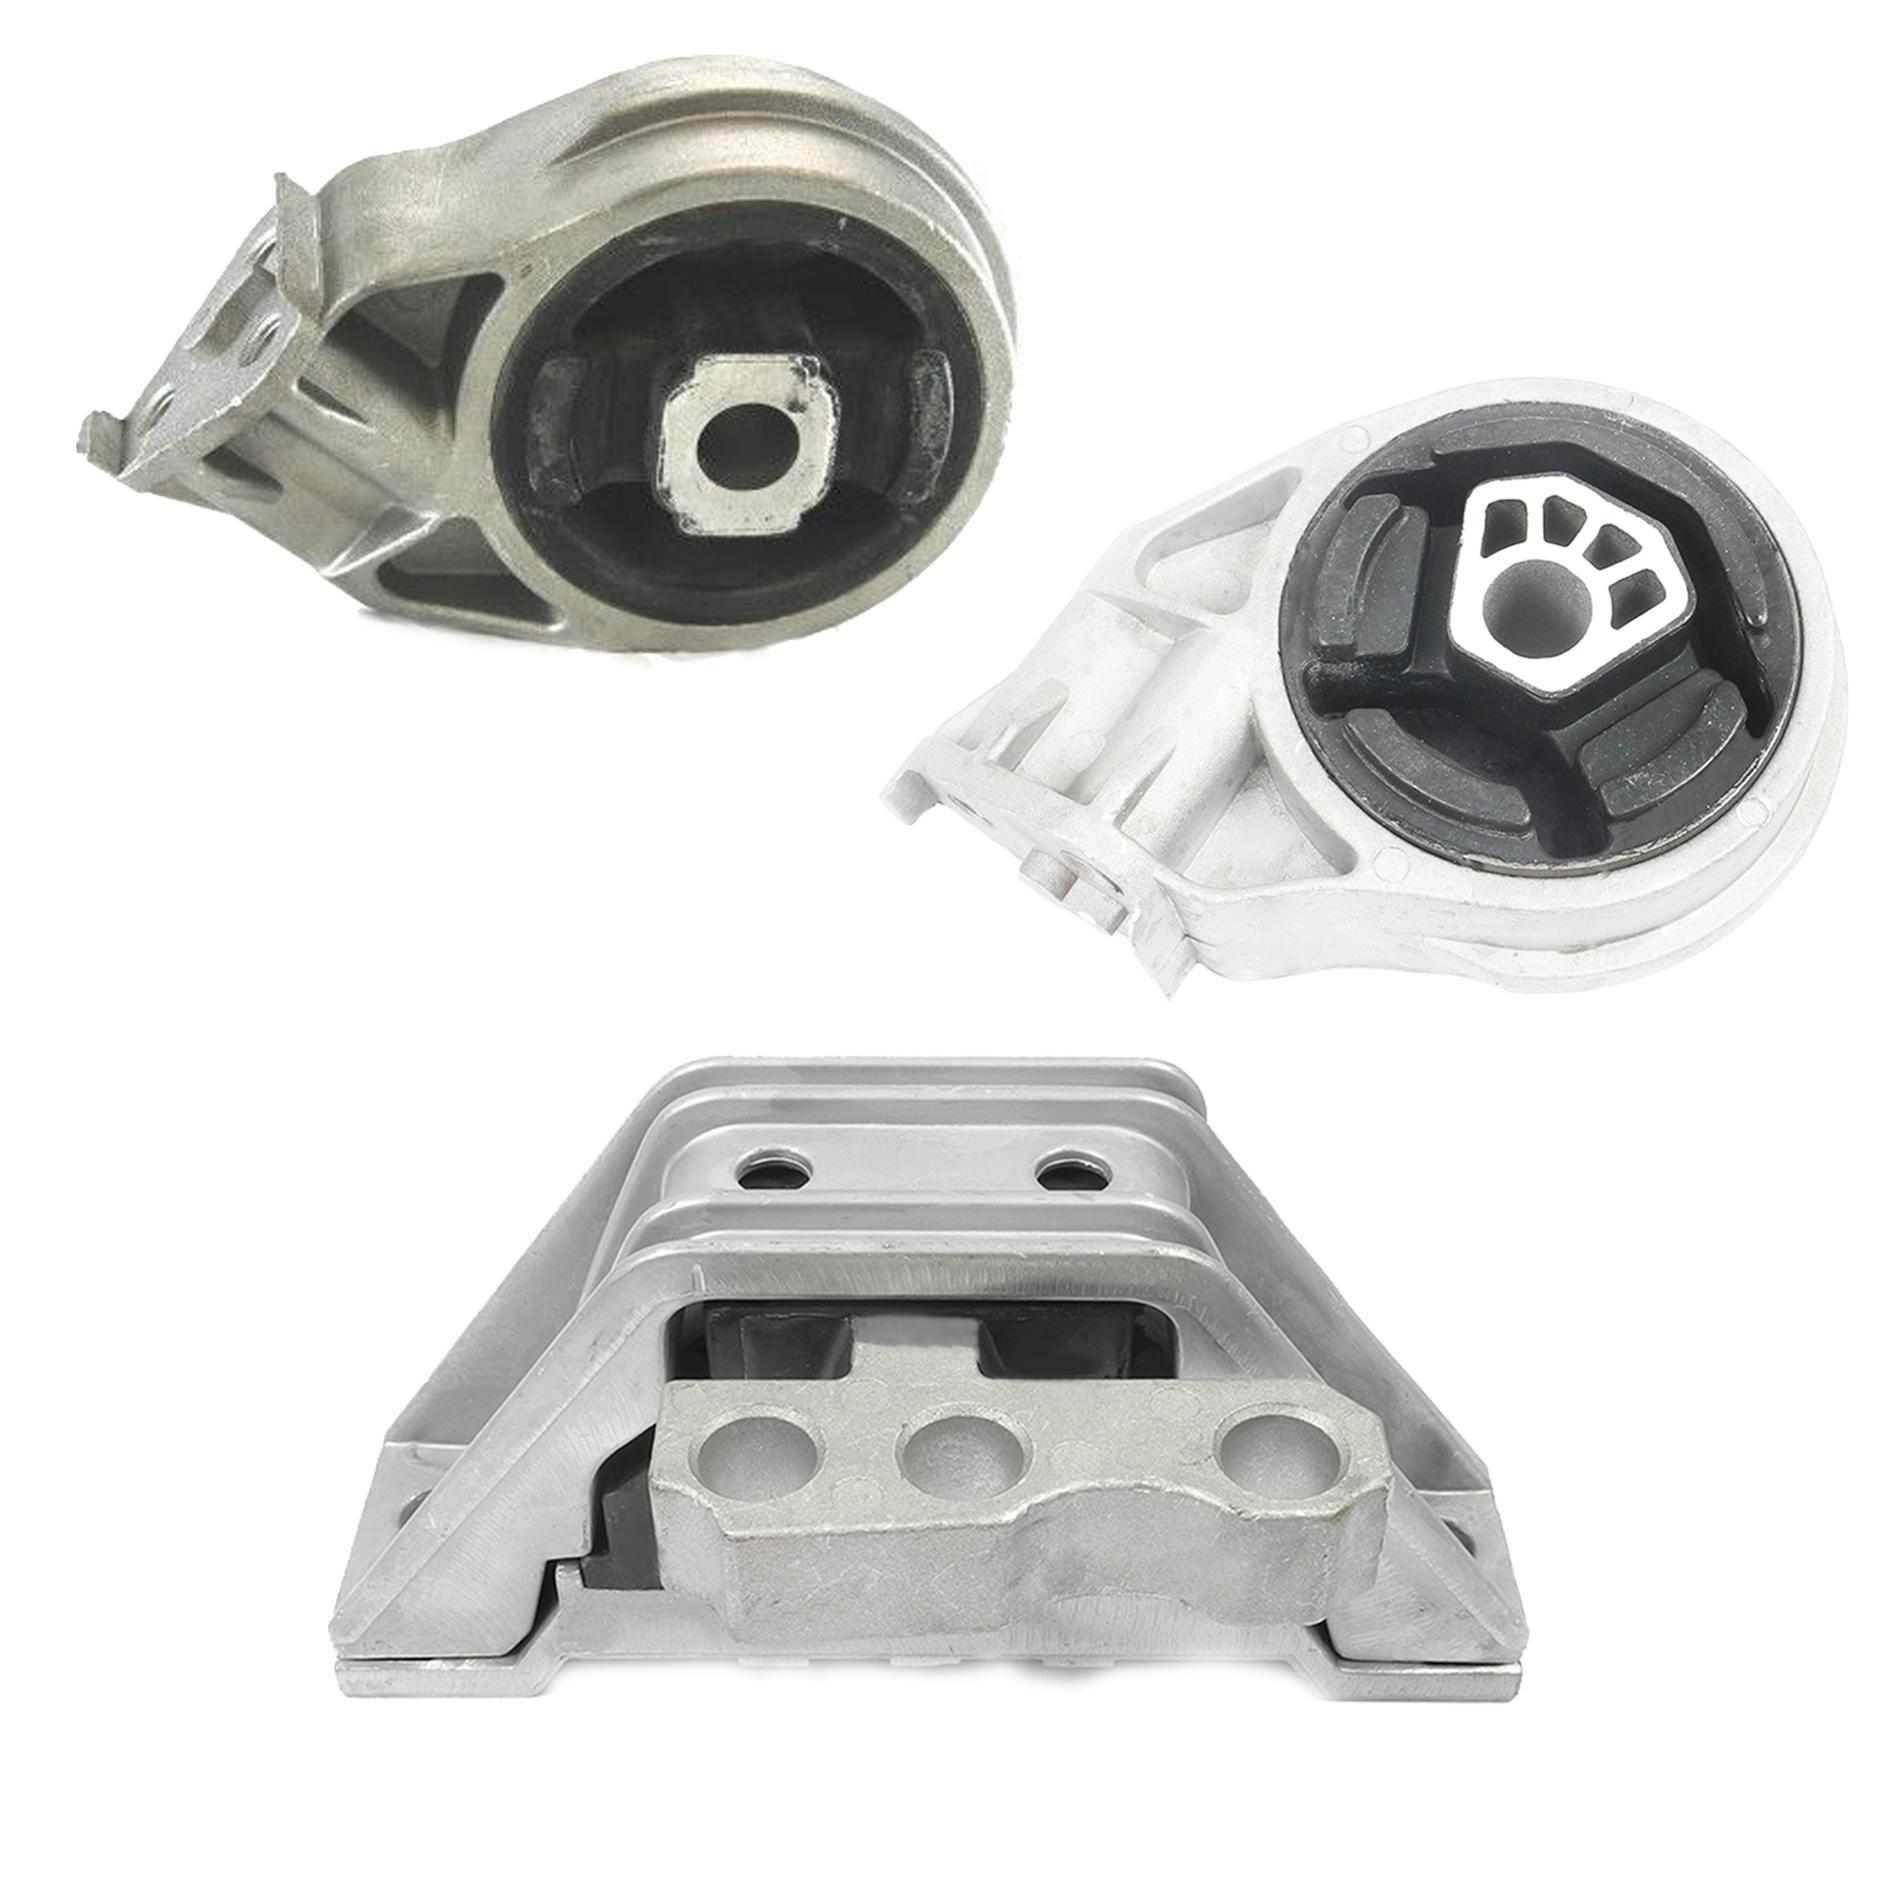 Engine Motor Trans Mount Set 3pcs For Chevrolet Hhr Ss Panel